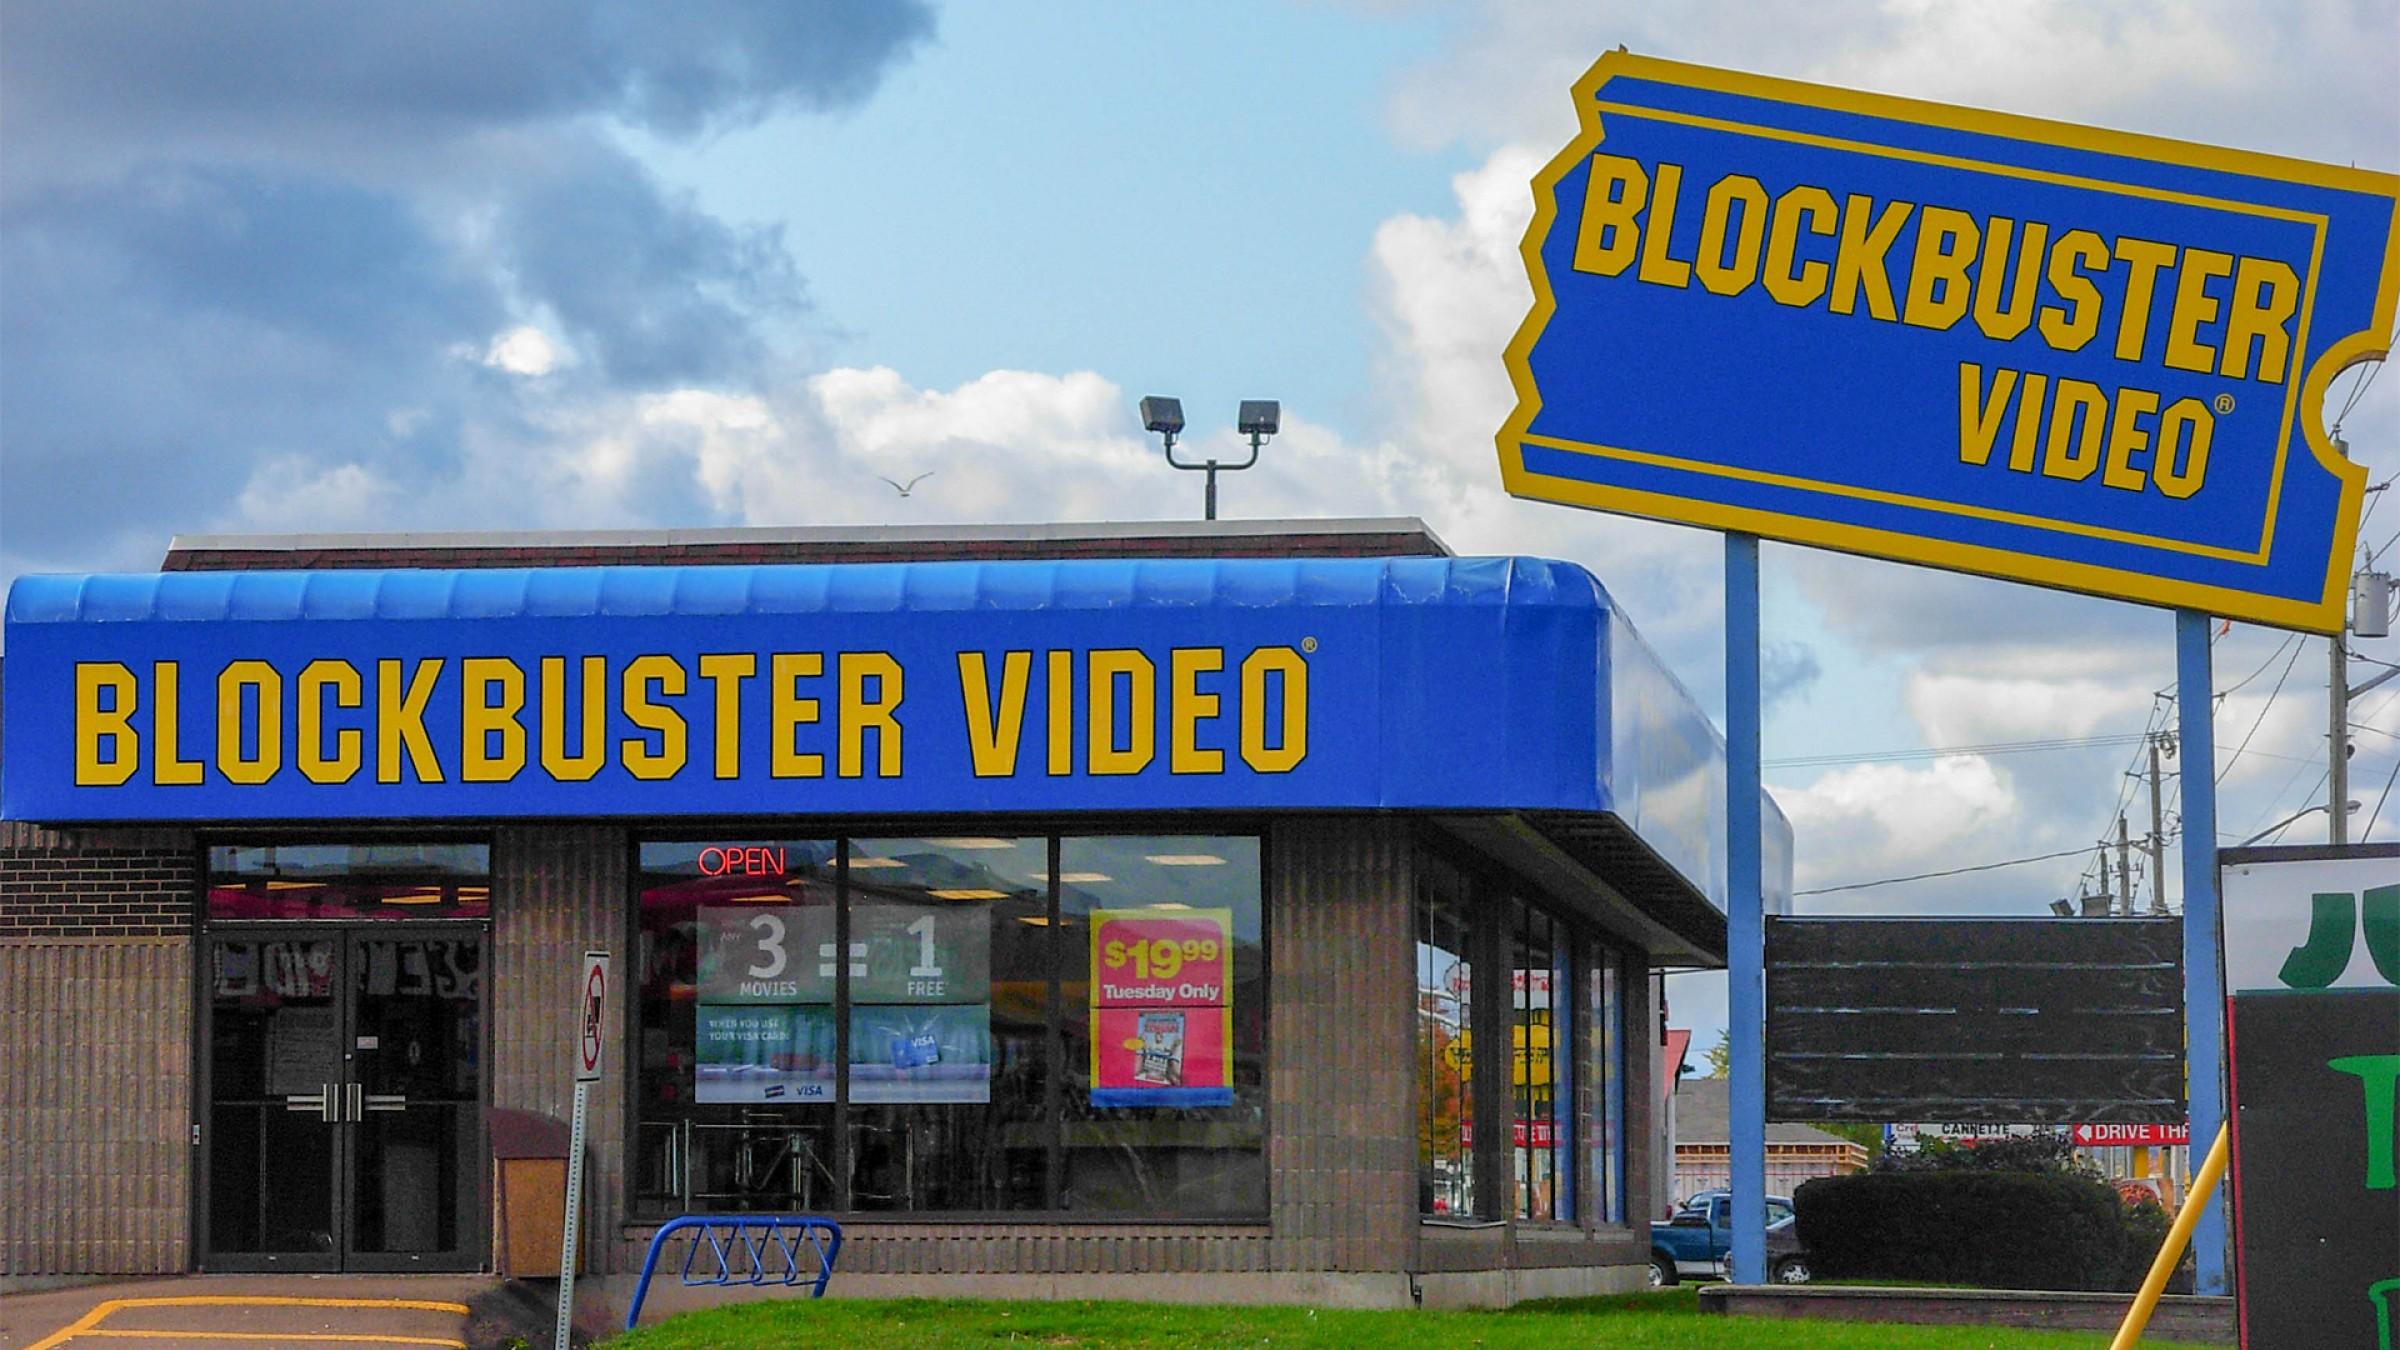 Is Blockbuster Back?